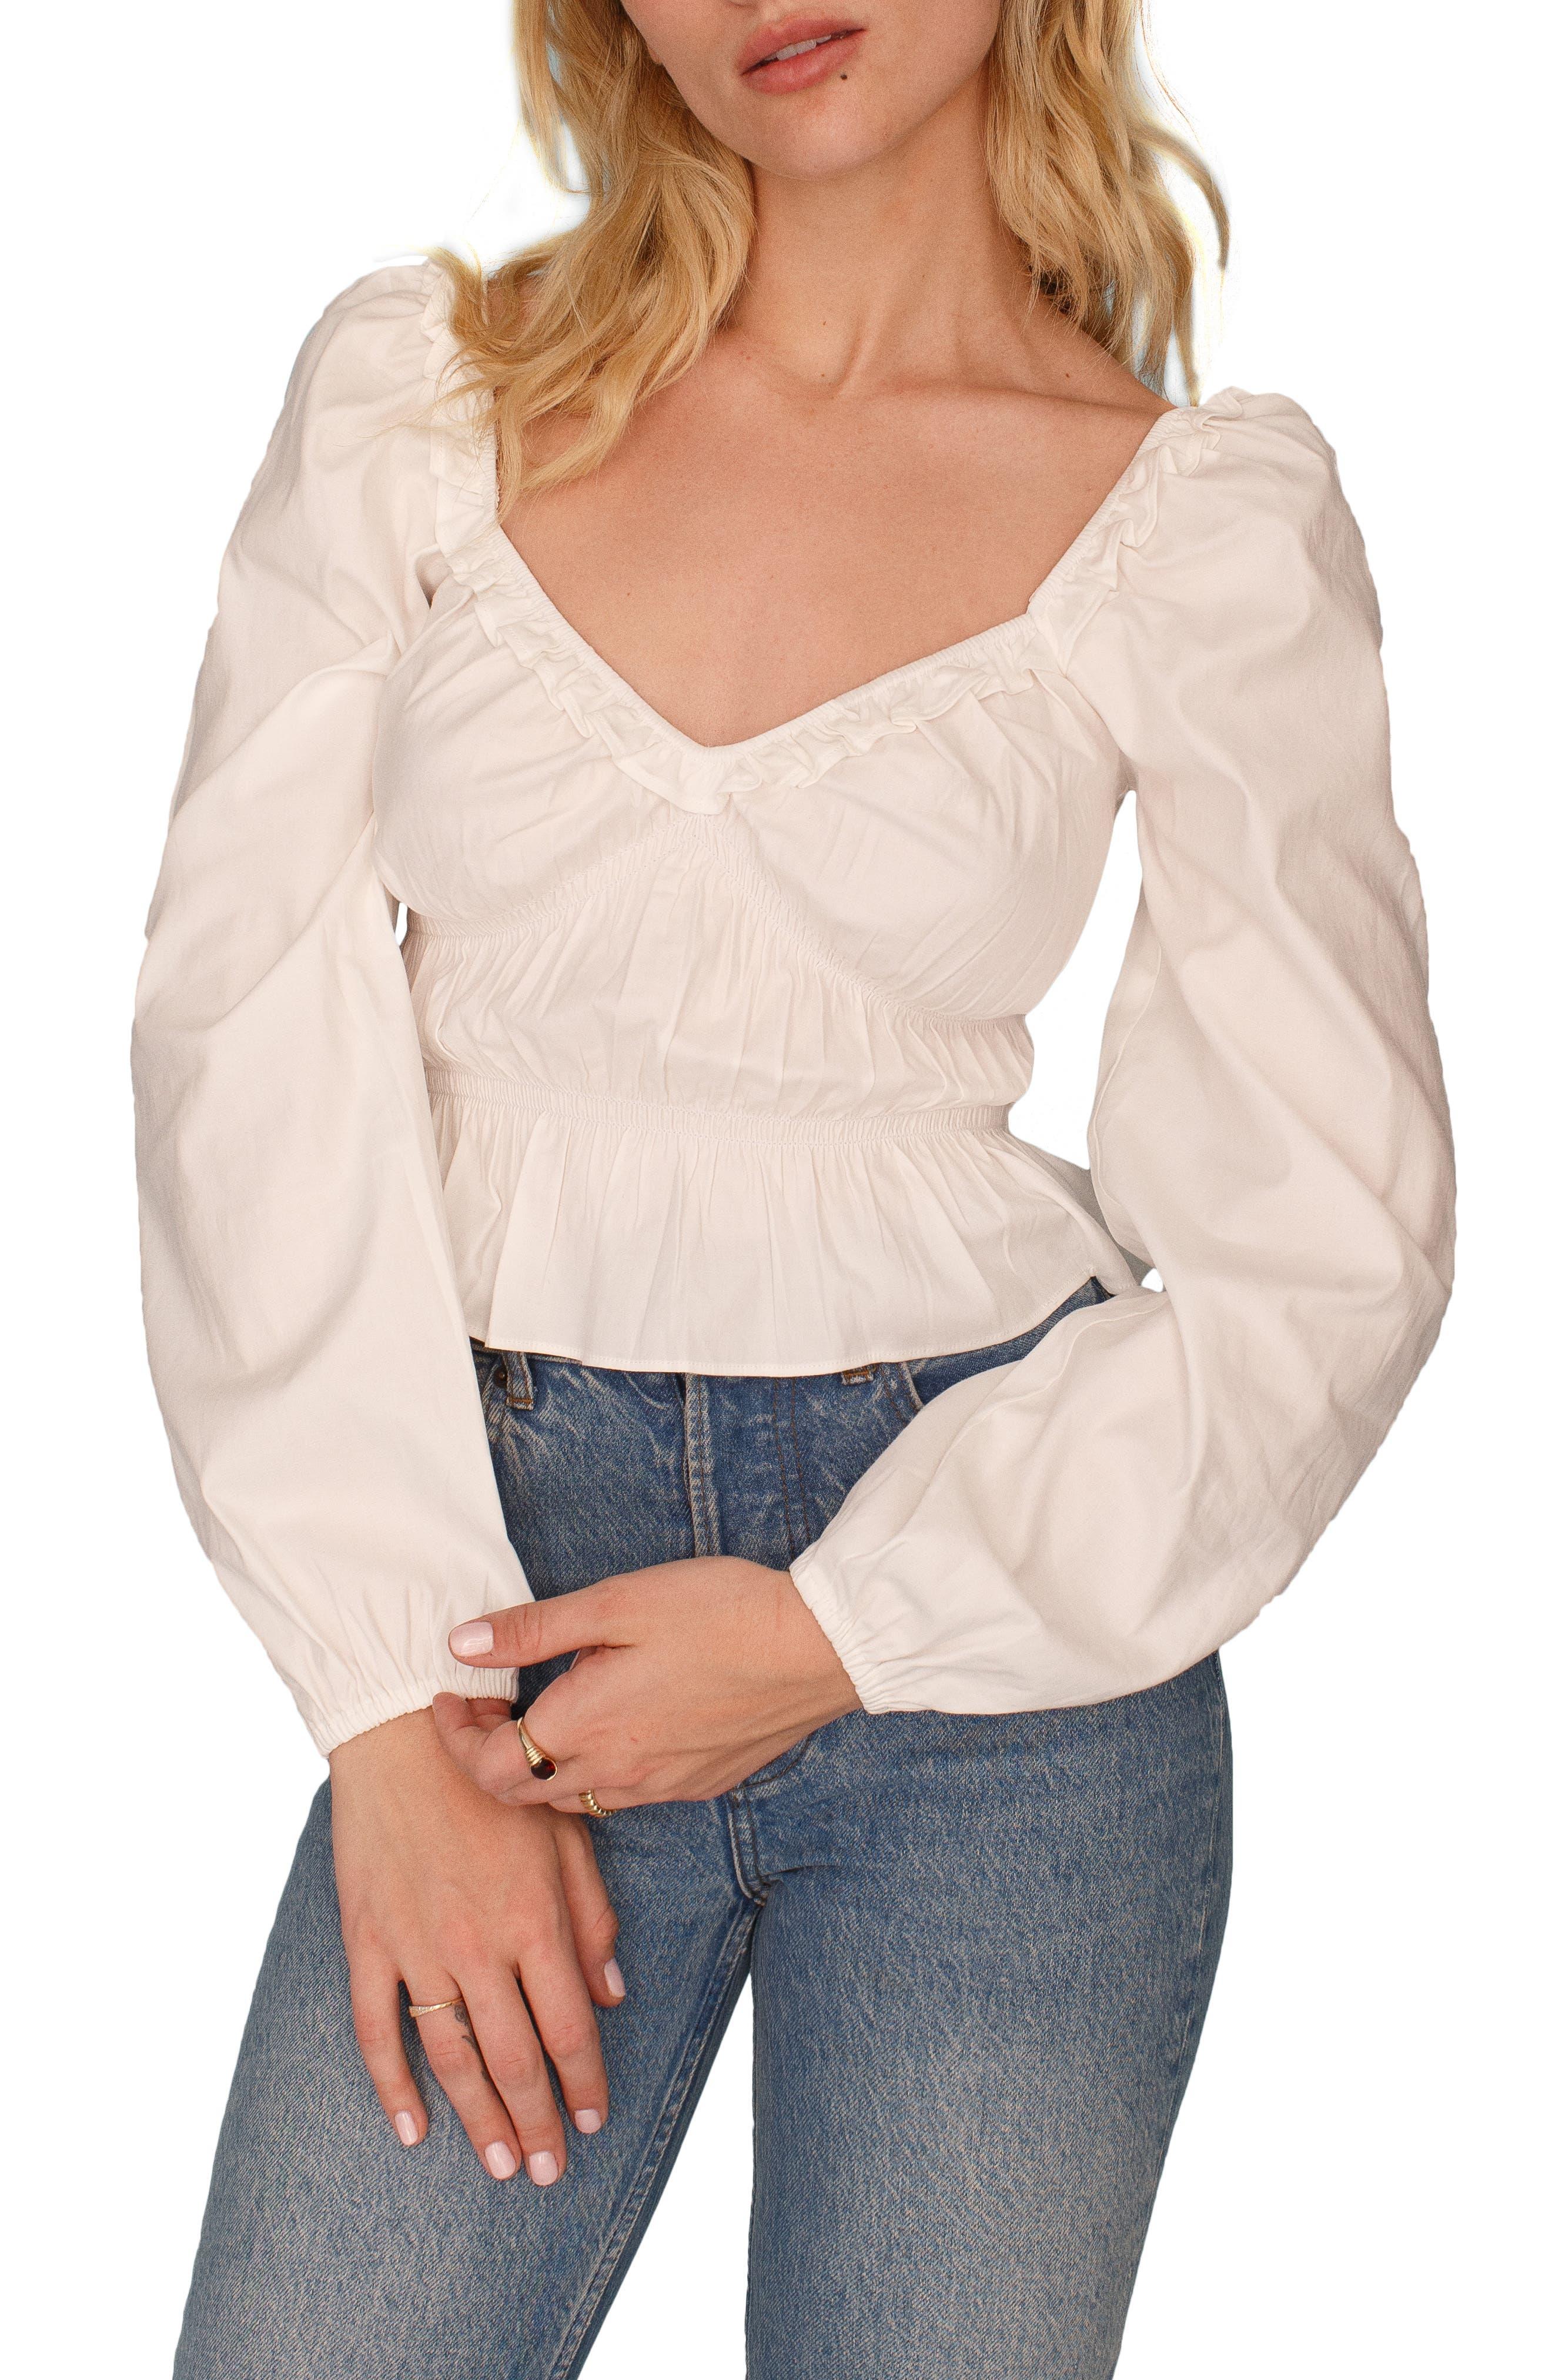 Black Silk Rib Knit Short Sleeve Top With Ivory Cotton Ruffle M